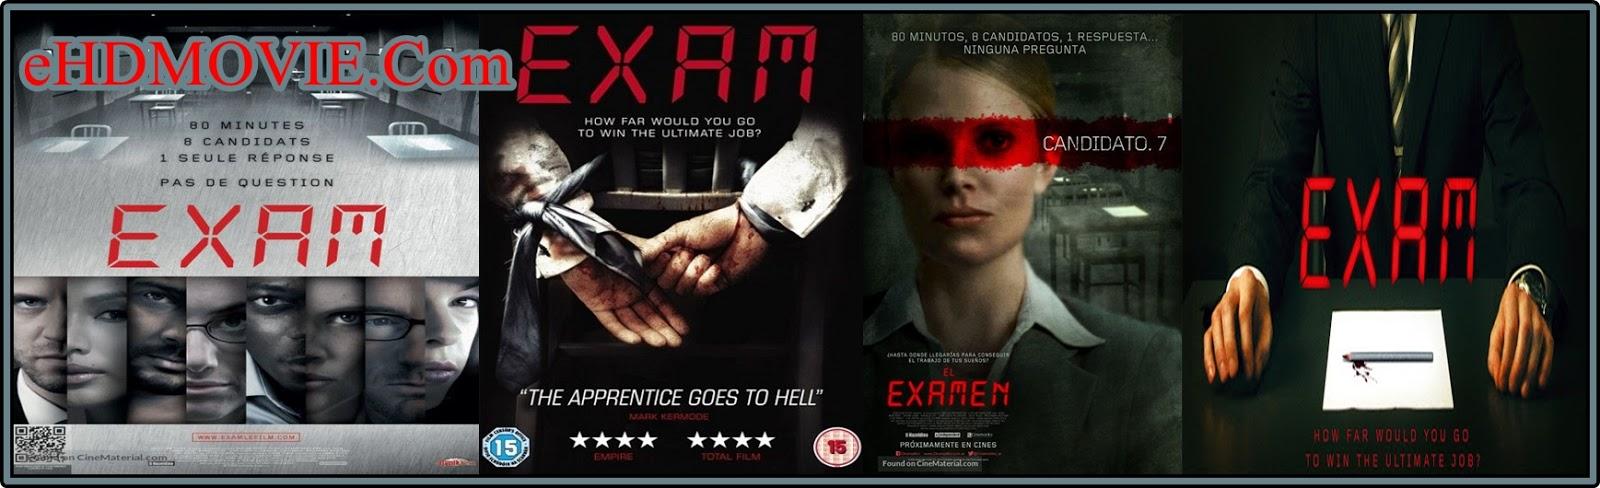 Exam 2009 Full Movie English 720p - 480p ORG BRRip 300MB - 650MB ESubs Free Download